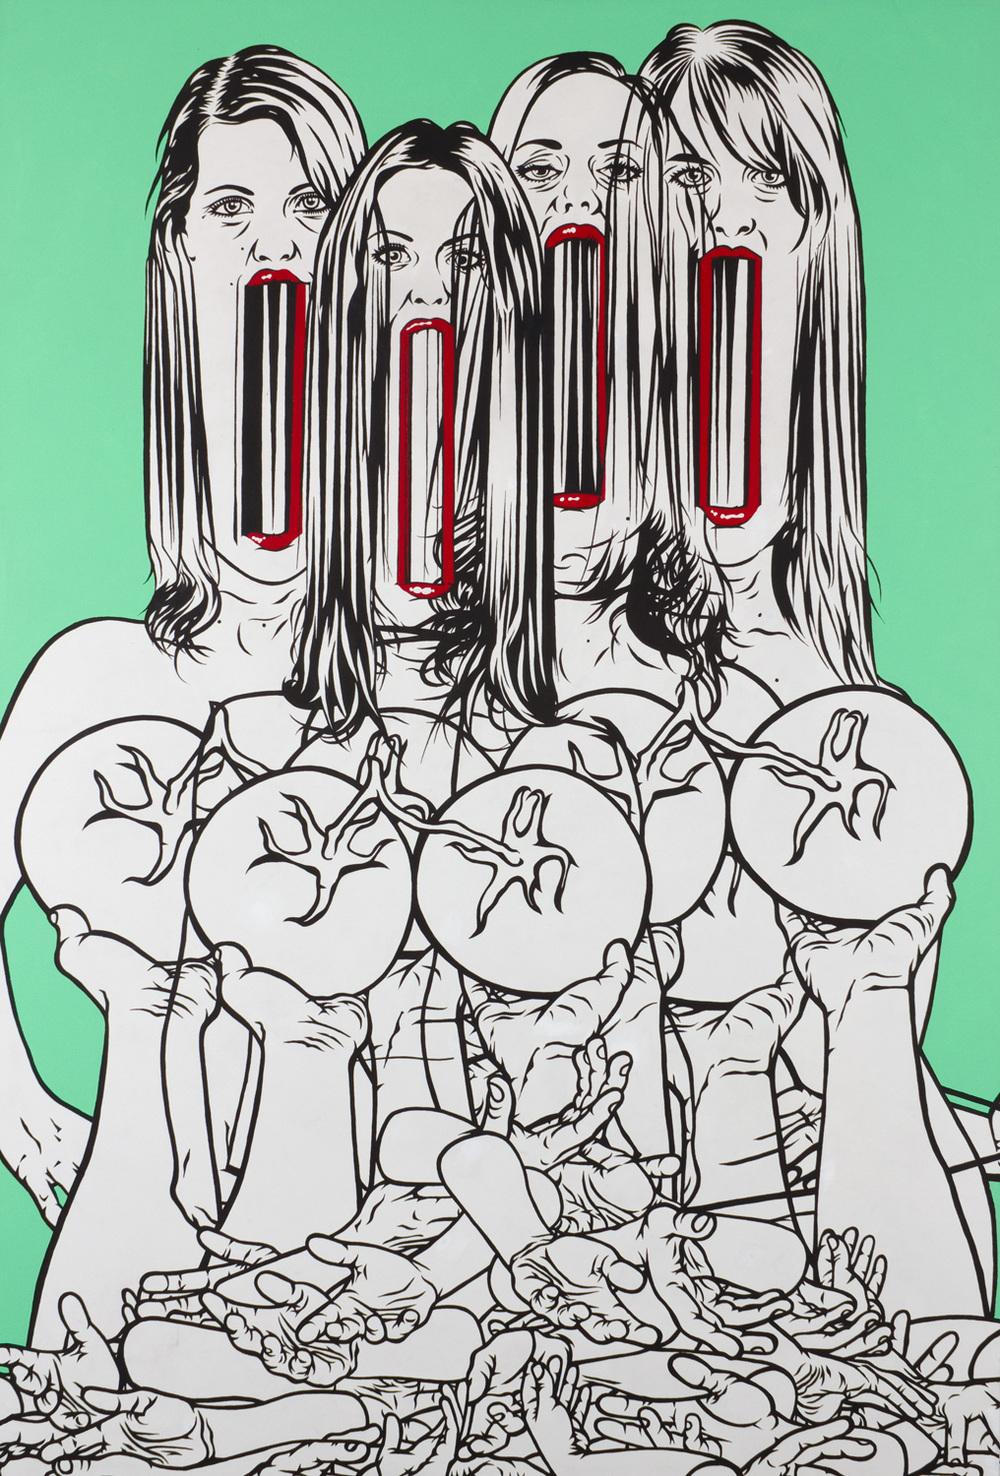 Tim Andrew.  Untitled. (4 girls). 1.0 x 1.5m Acrylic on canvas. 2010